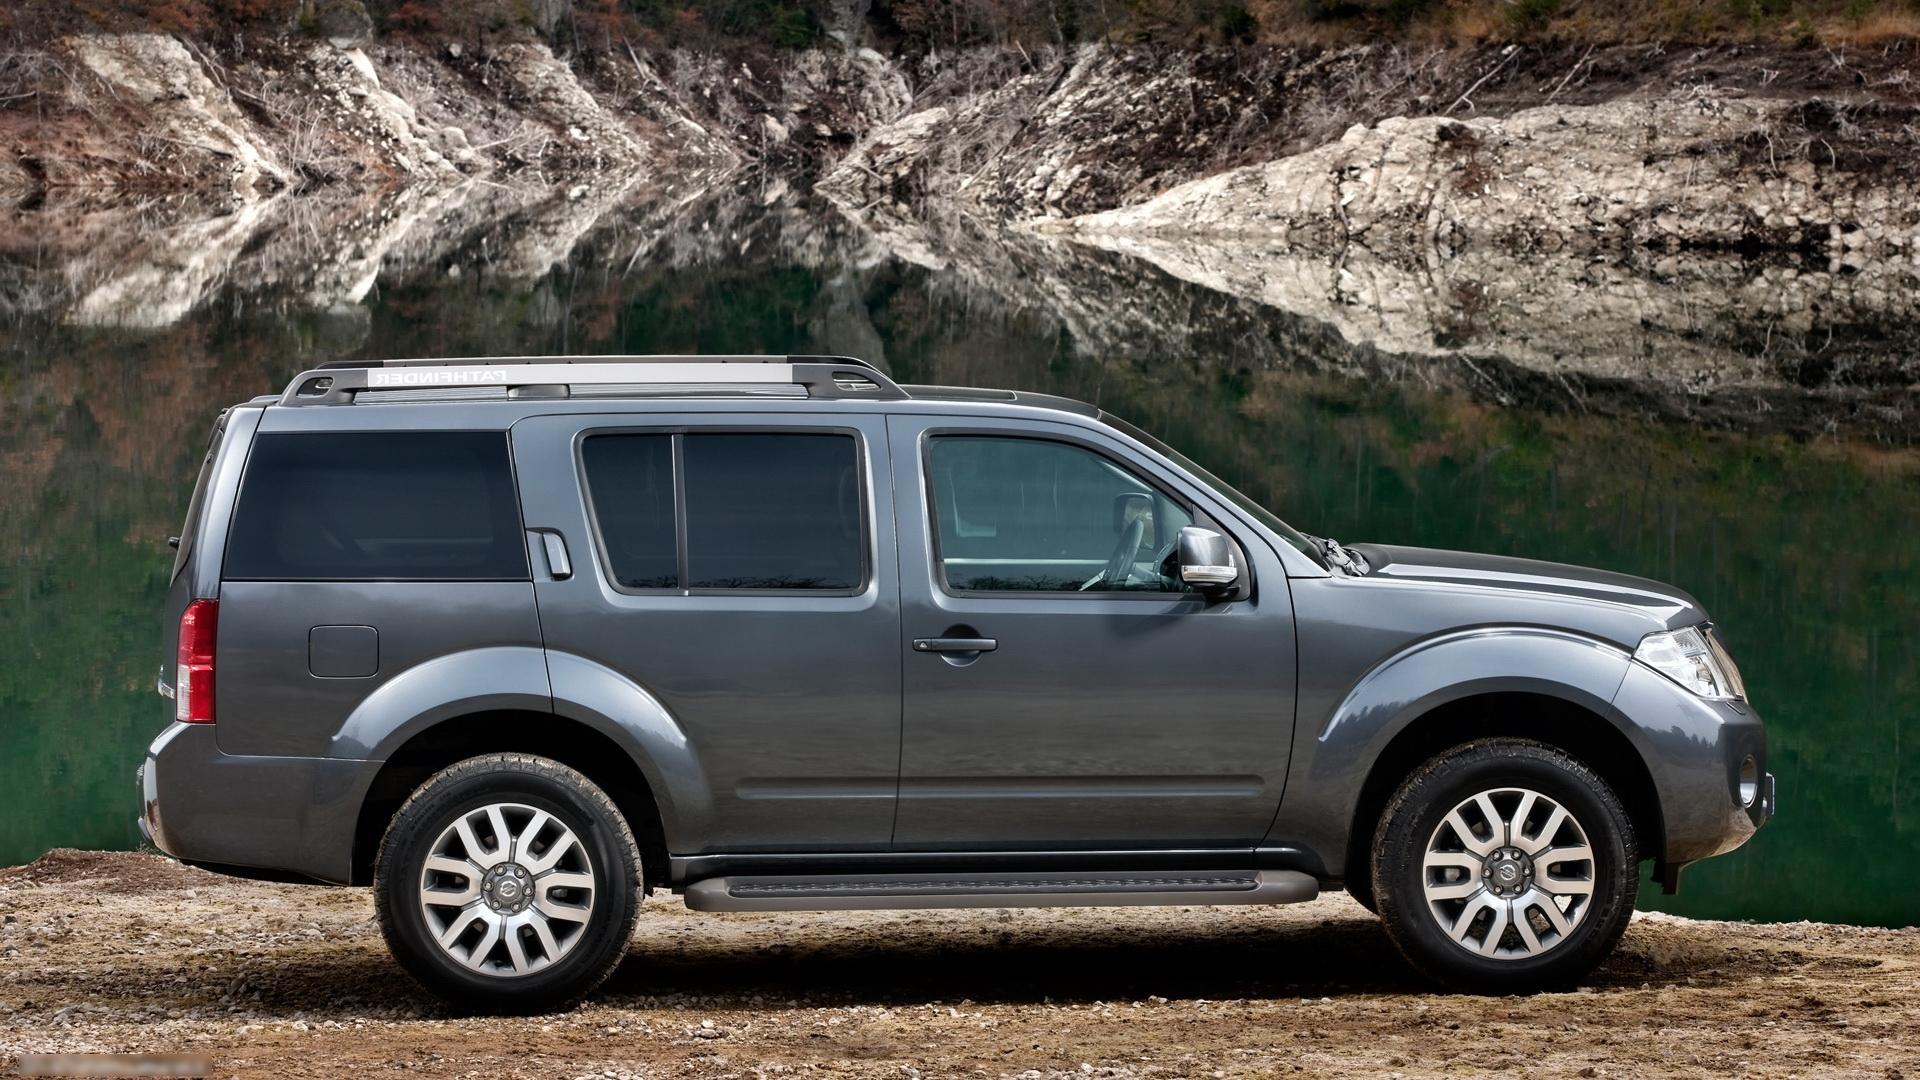 2012 Nissan Pathfinder Image 18